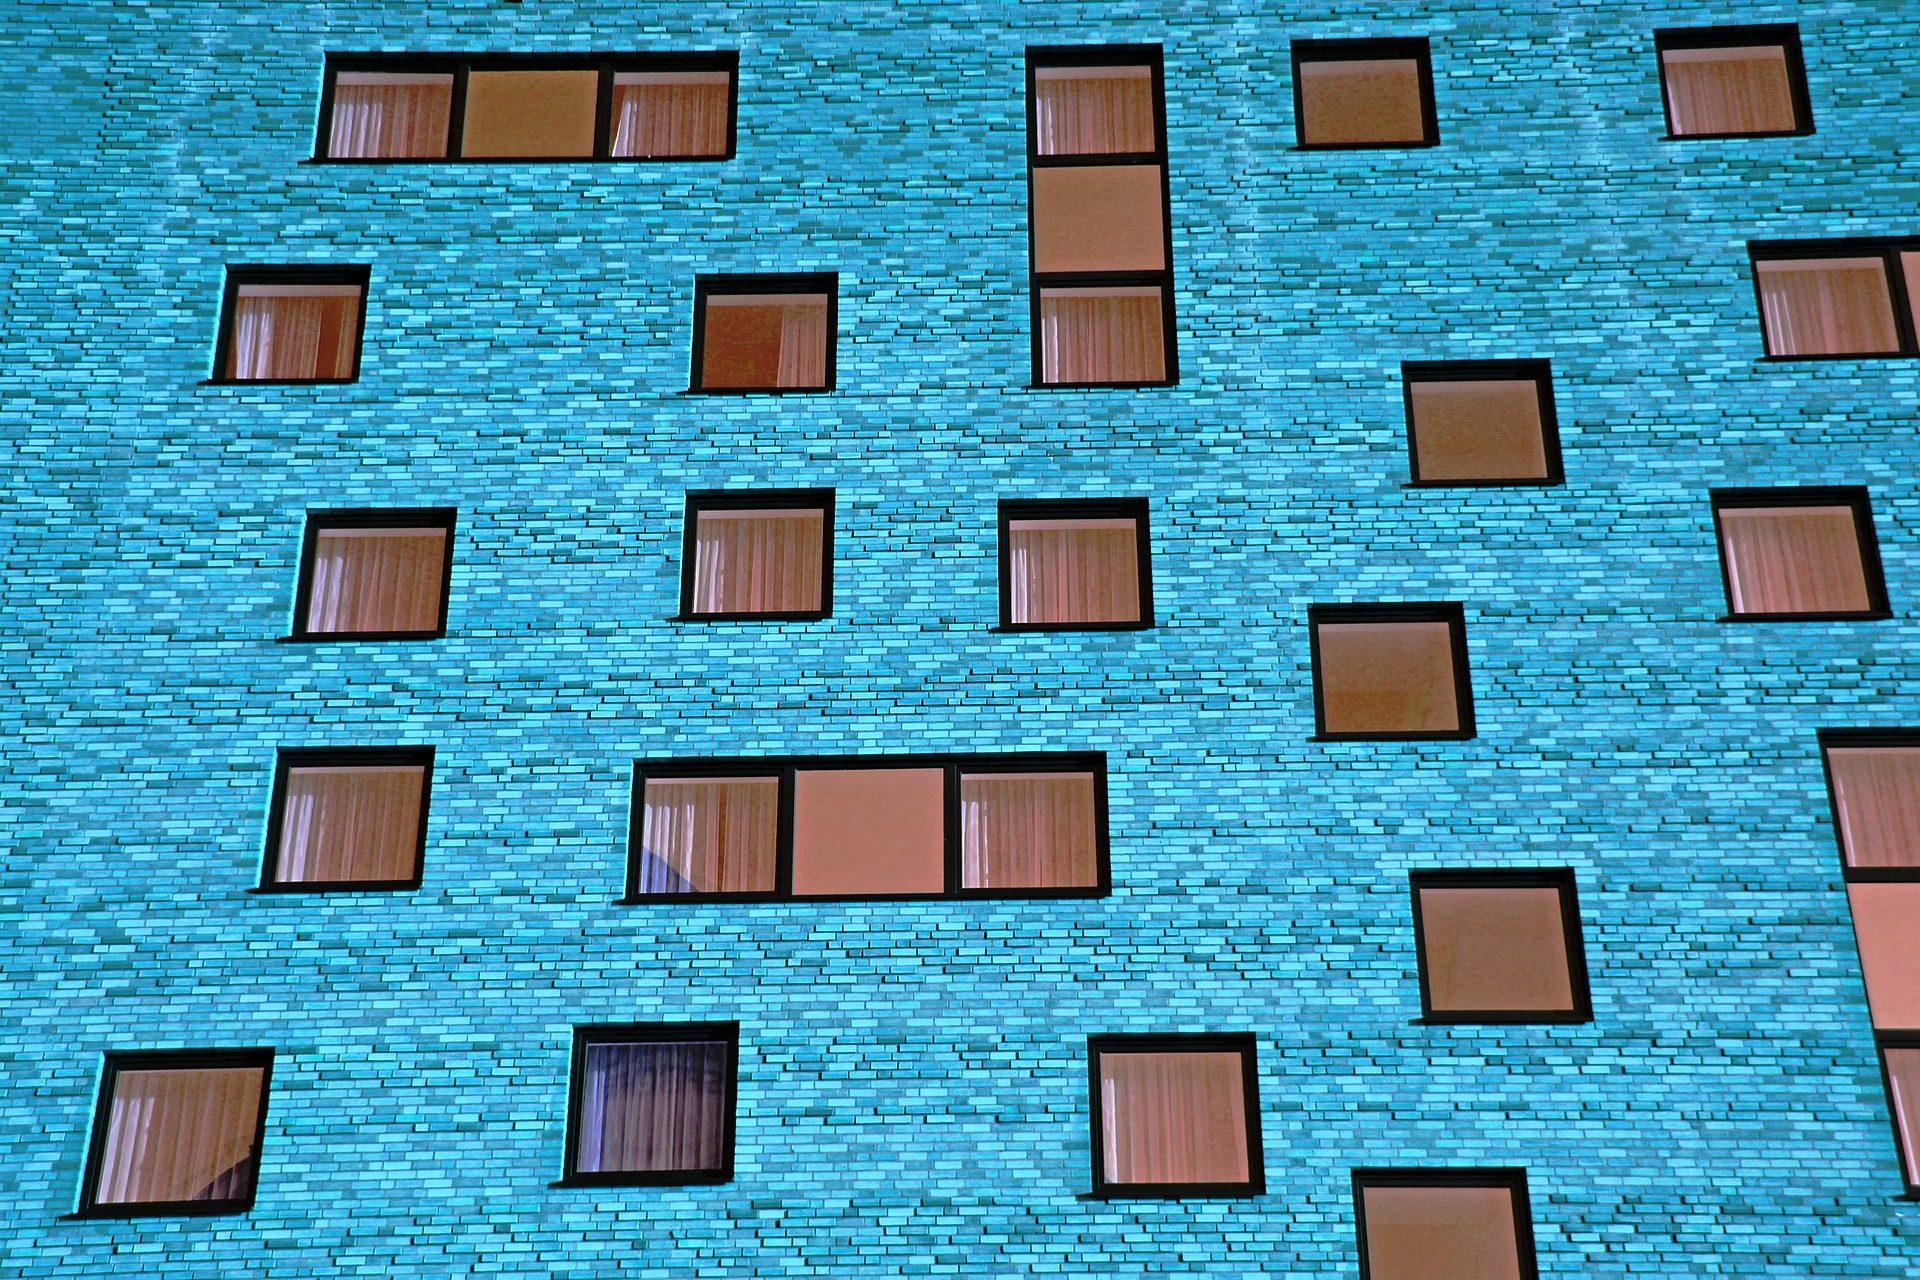 costruzione, facciata, Appartamenti, Windows, Blu - Sfondi HD - Professor-falken.com